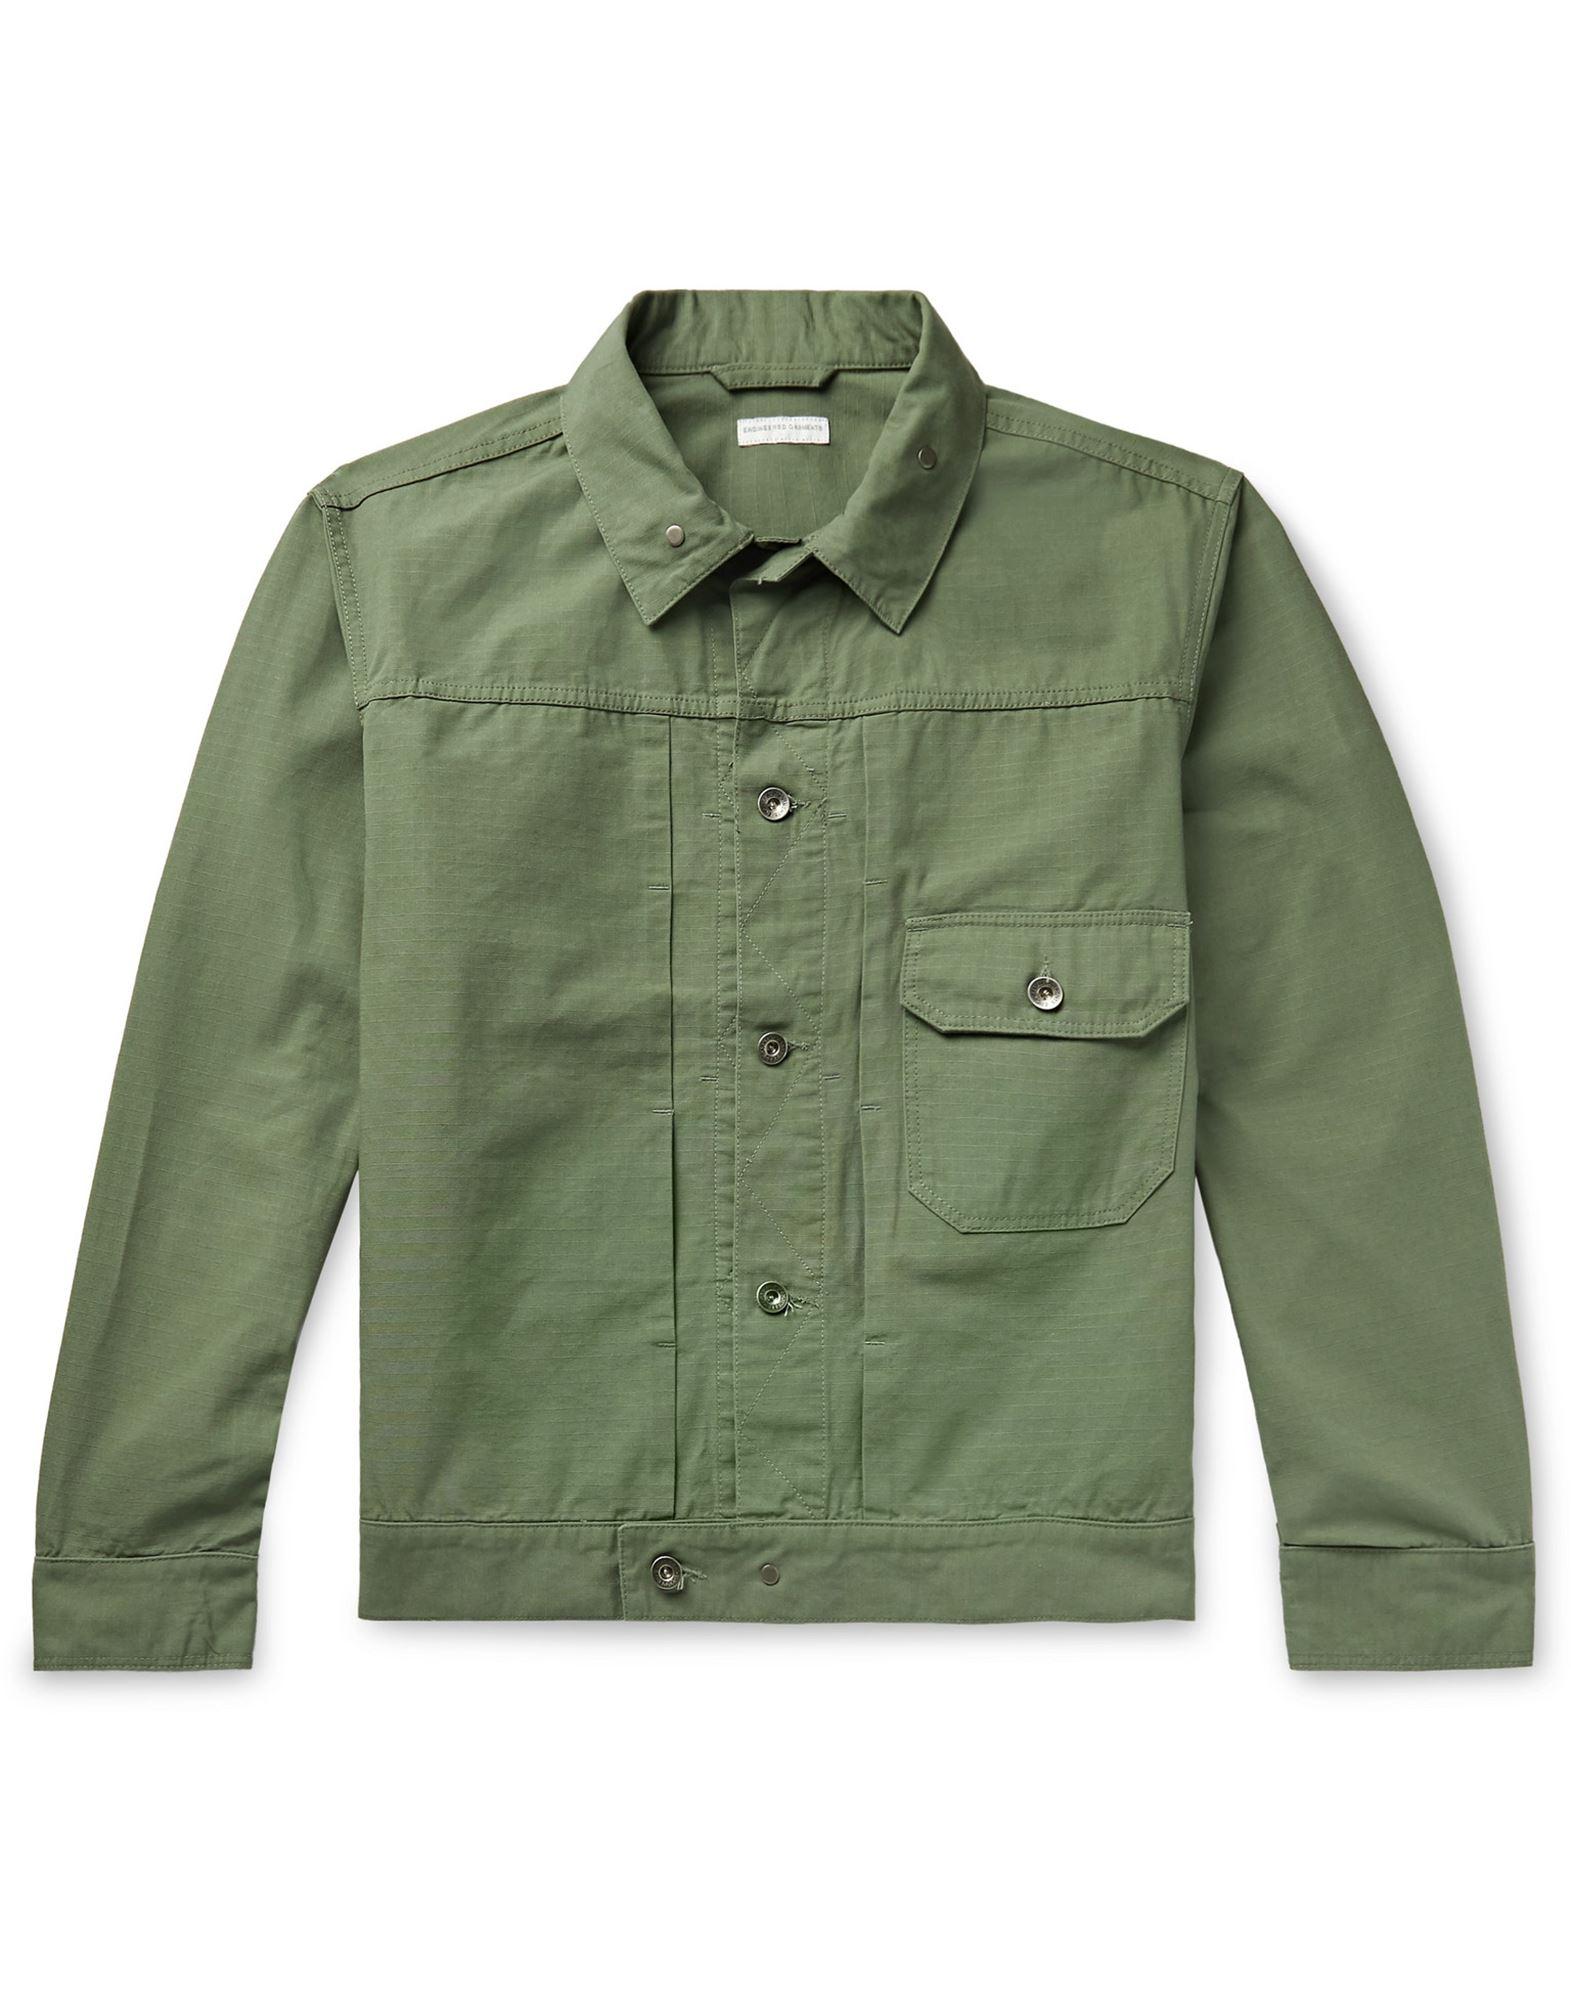 Фото - ENGINEERED GARMENTS Куртка gabriela coll garments пальто